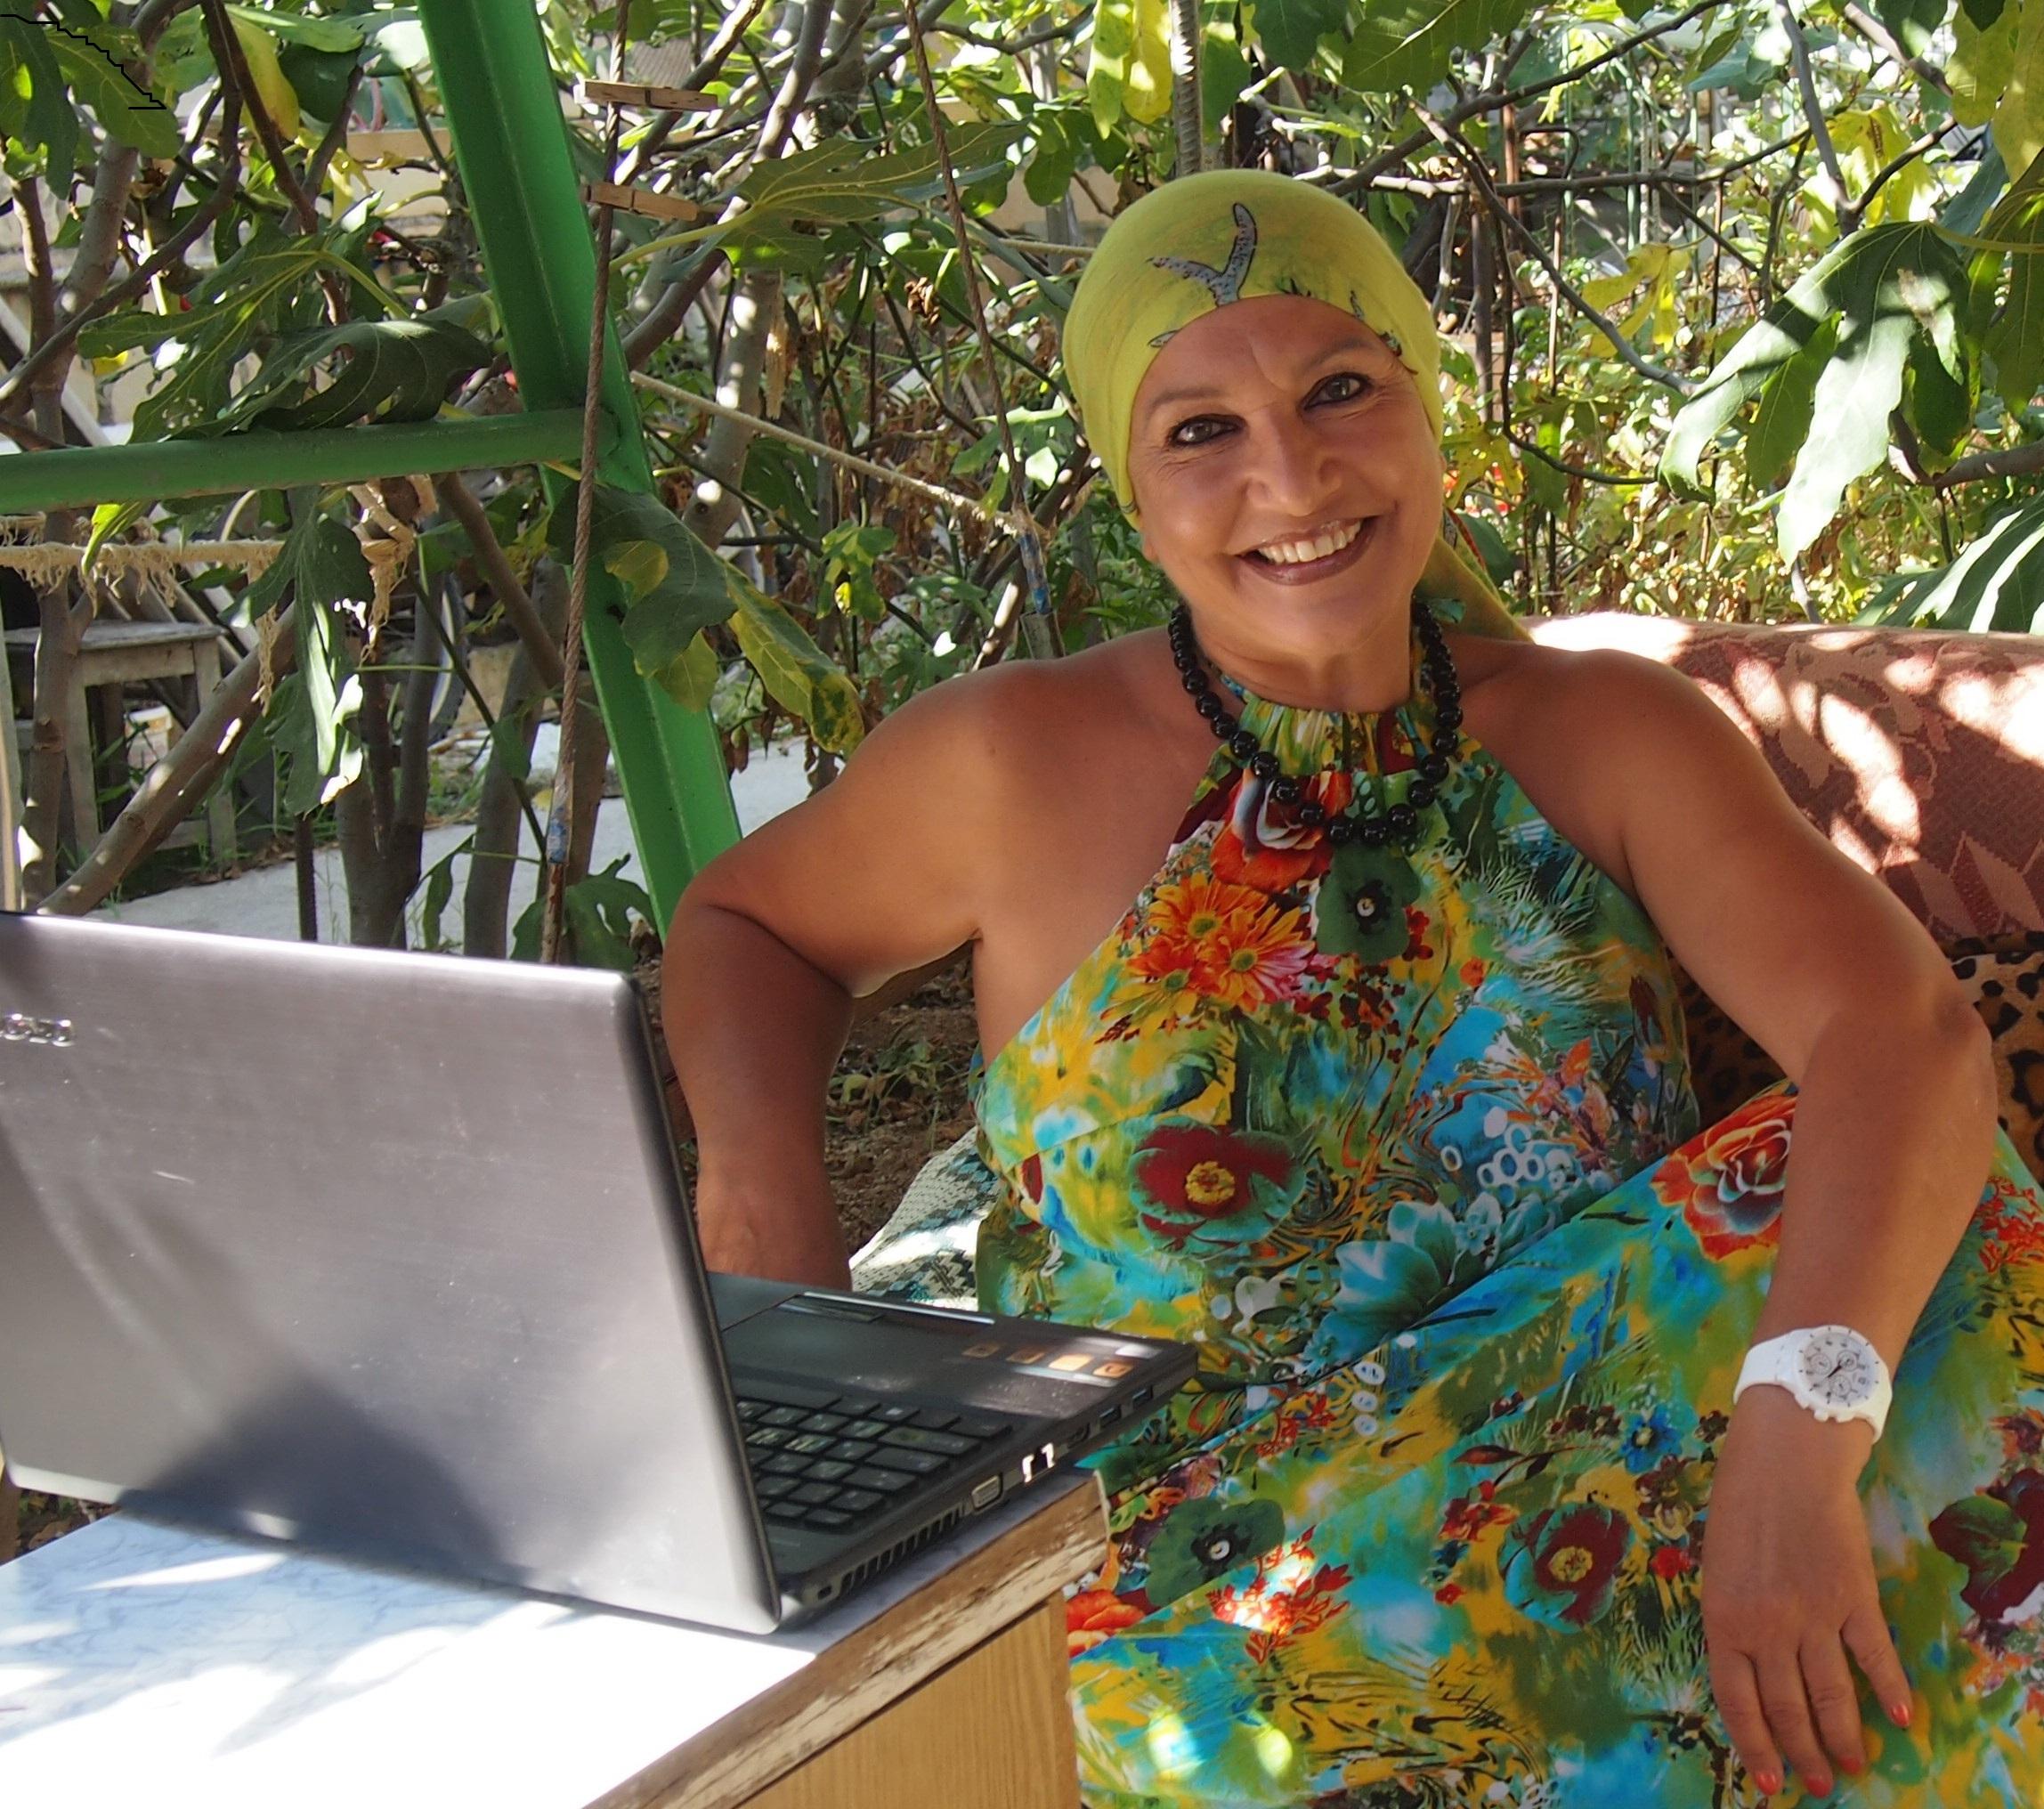 Таня Карацуба Сеид-Бурхан, лето 2014,  Крым